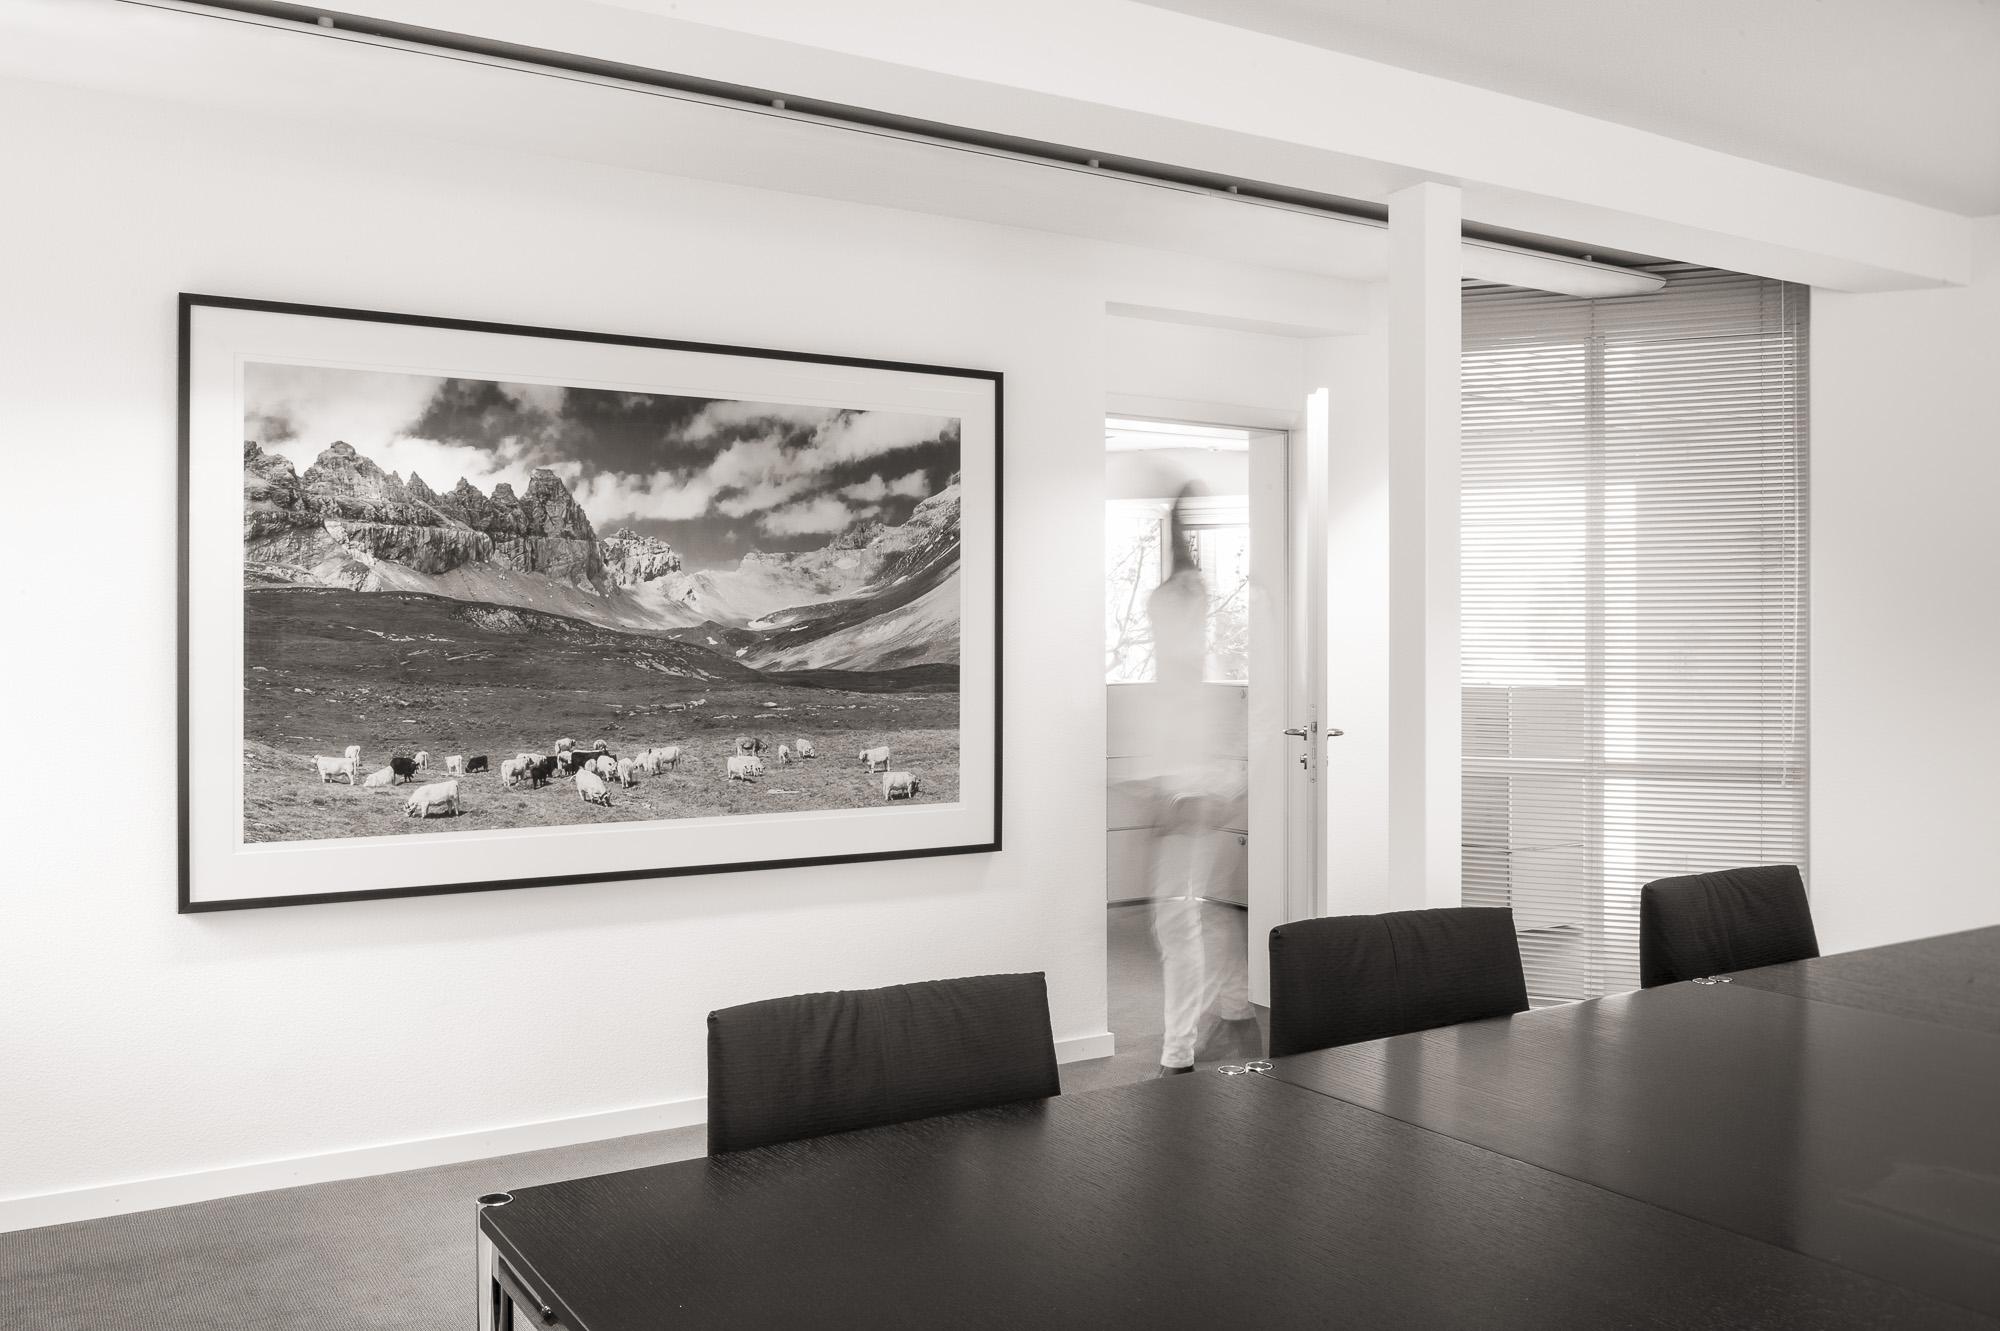 Herde vor Tschingelhörner  3/10 fine art print Hahnemühle 192cm x 111cm Rahmen Wenge 215cm x 132cm